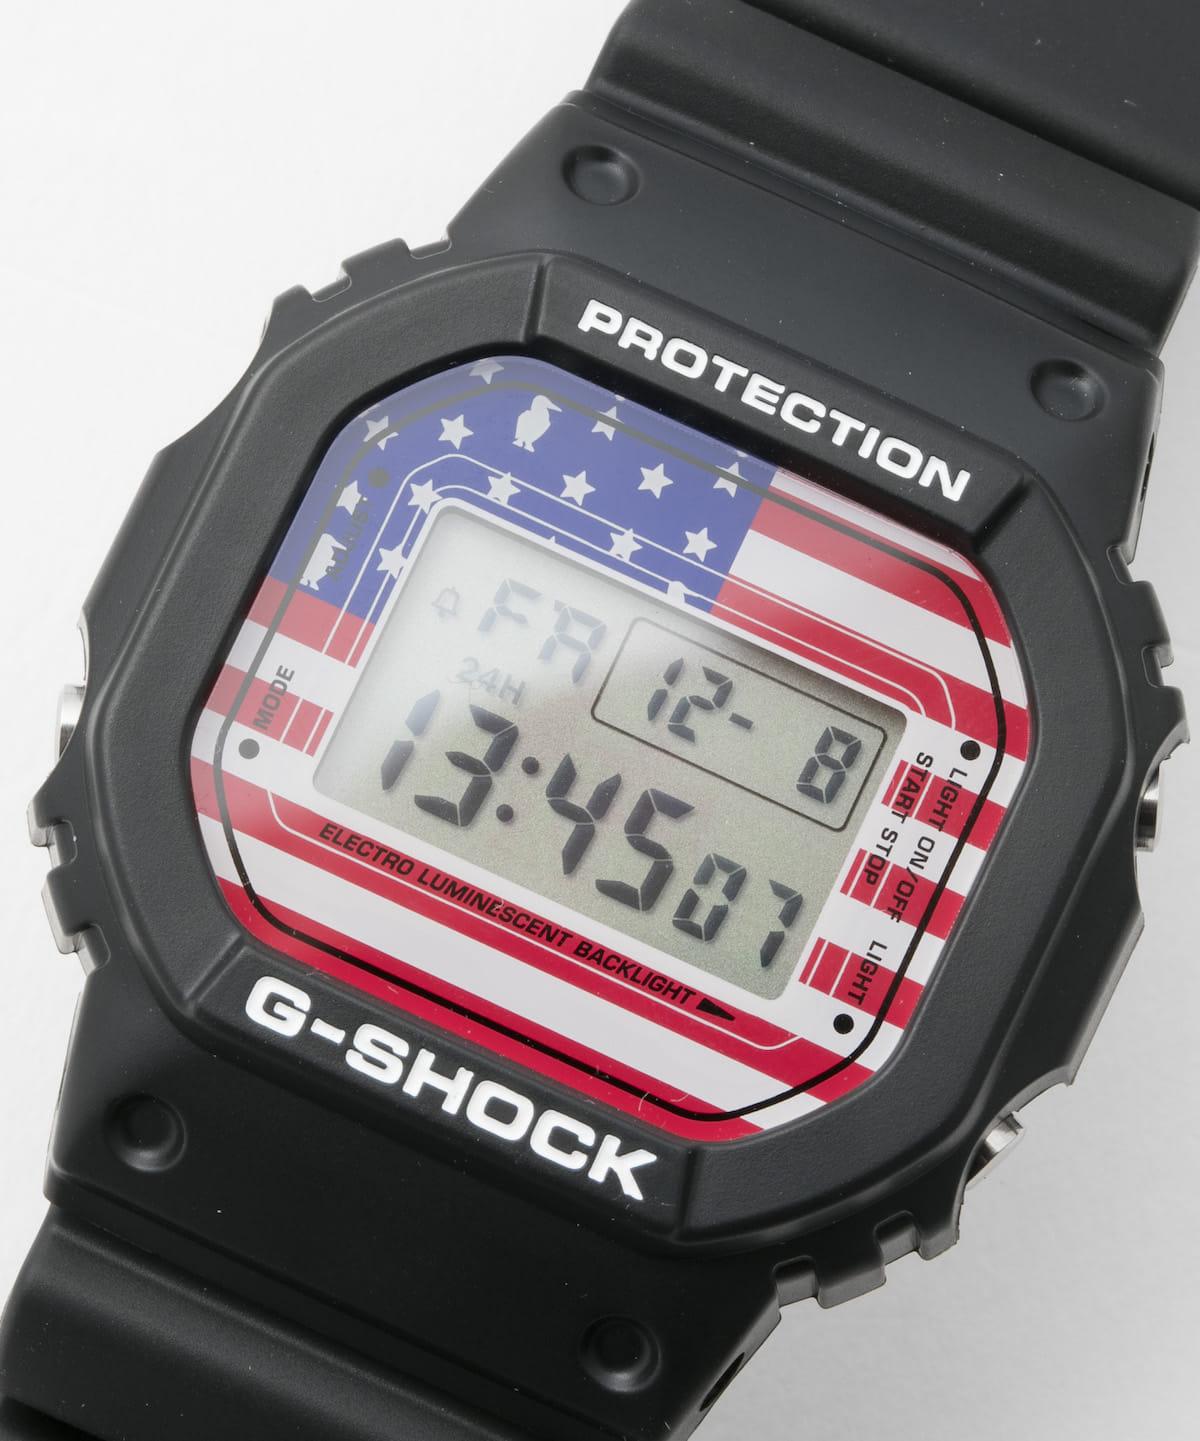 CHUMS×G-SHOCK!ともに35周年を迎えた両ブランドのコラボウォッチが登場! technology180316_chums-gshock_4-1200x1441